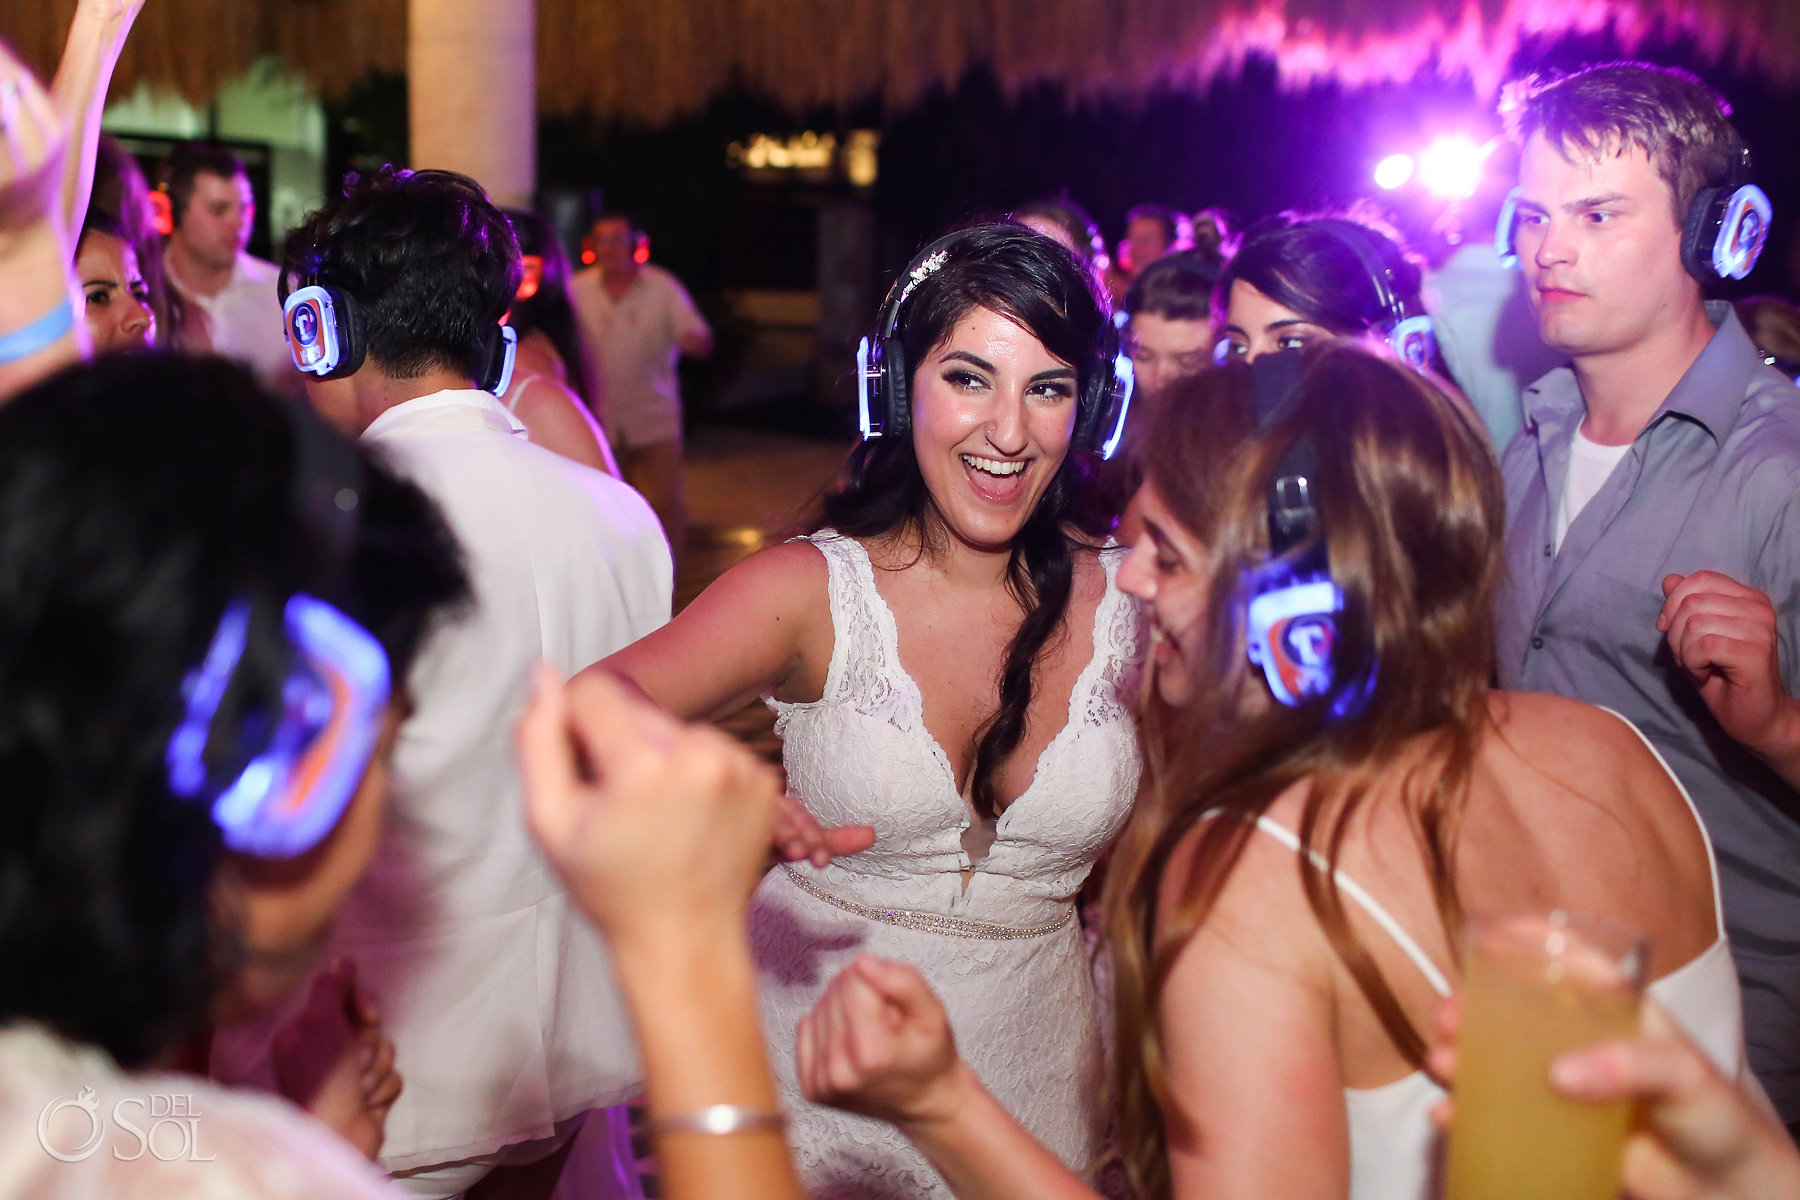 Lesbian Bride dancing at queer silent disco wedding reception